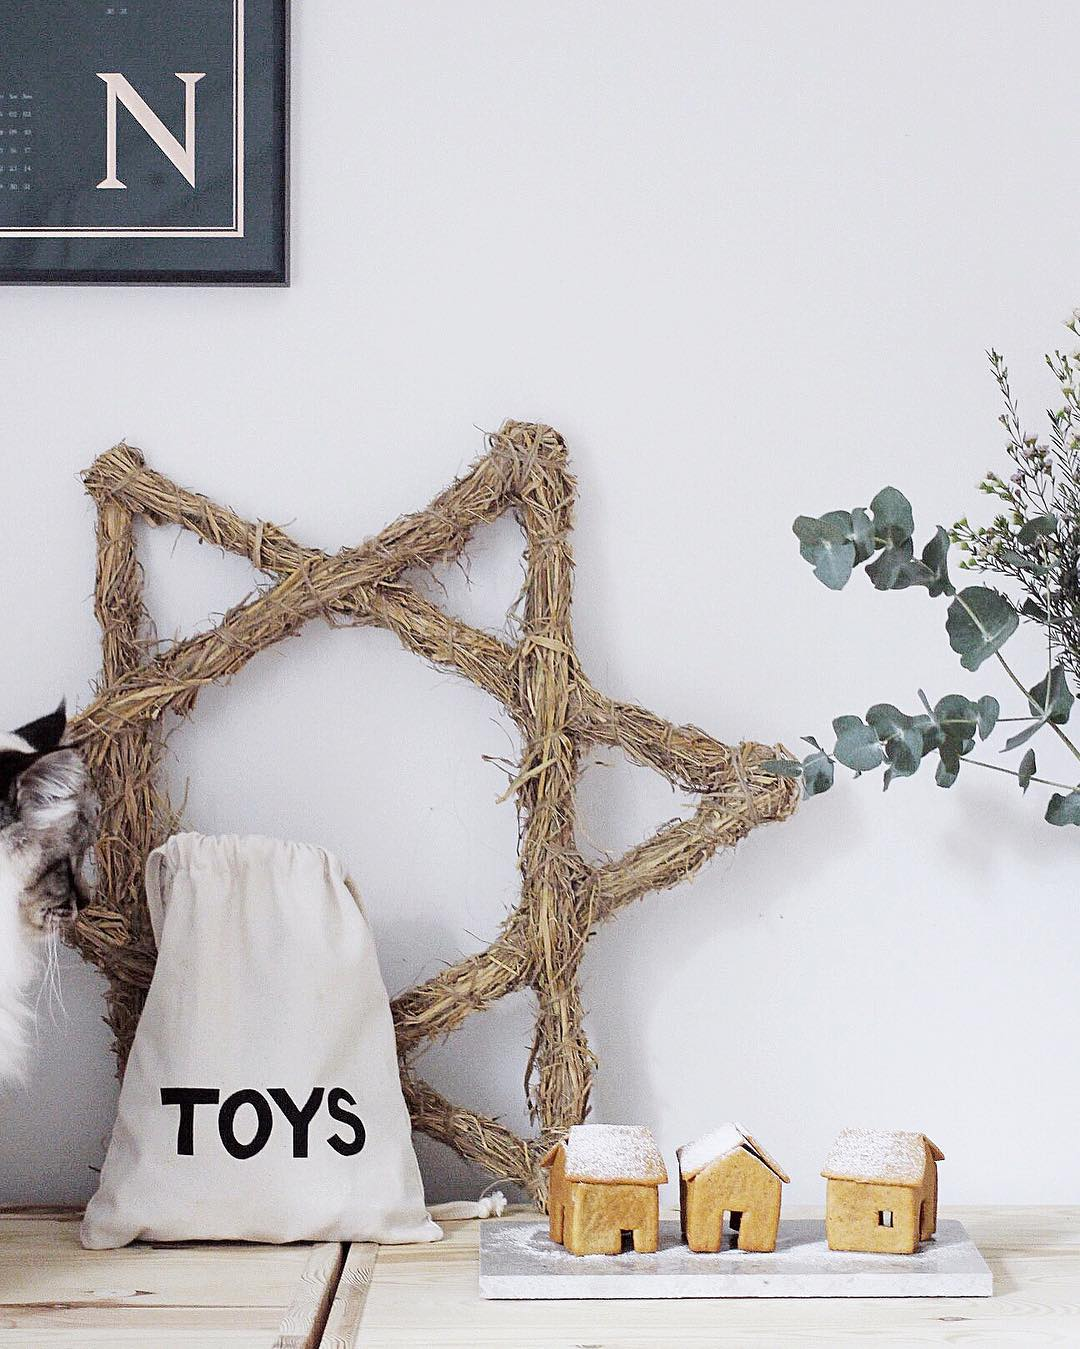 Tellkiddo 瑞典可愛圖案帆布收納袋 Toys (小)